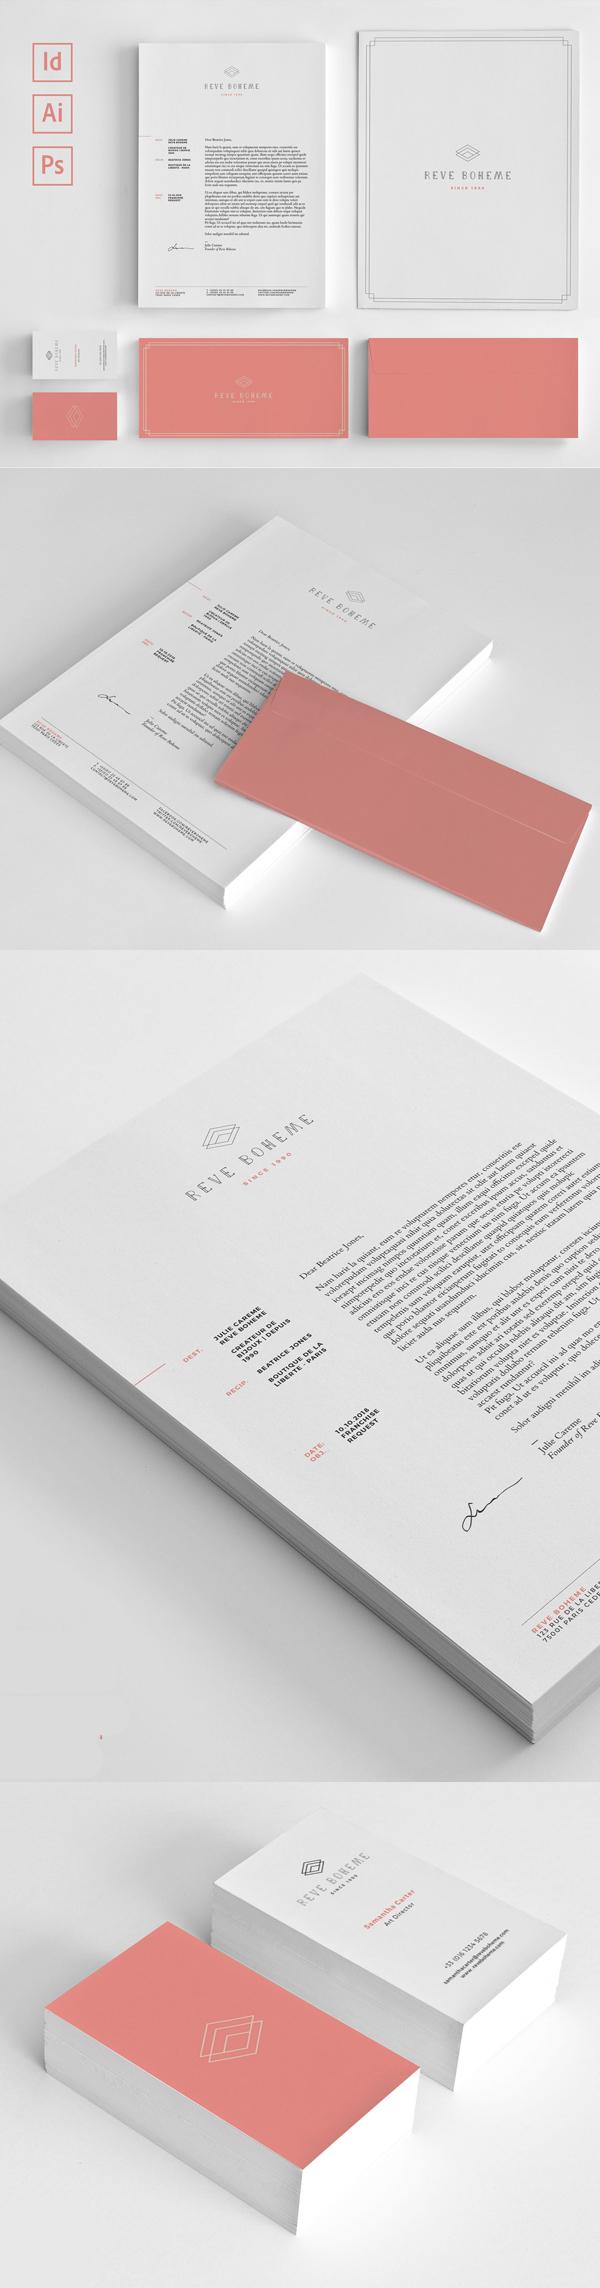 50 Professional Corporate Branding / Stationery Templates Design - 4